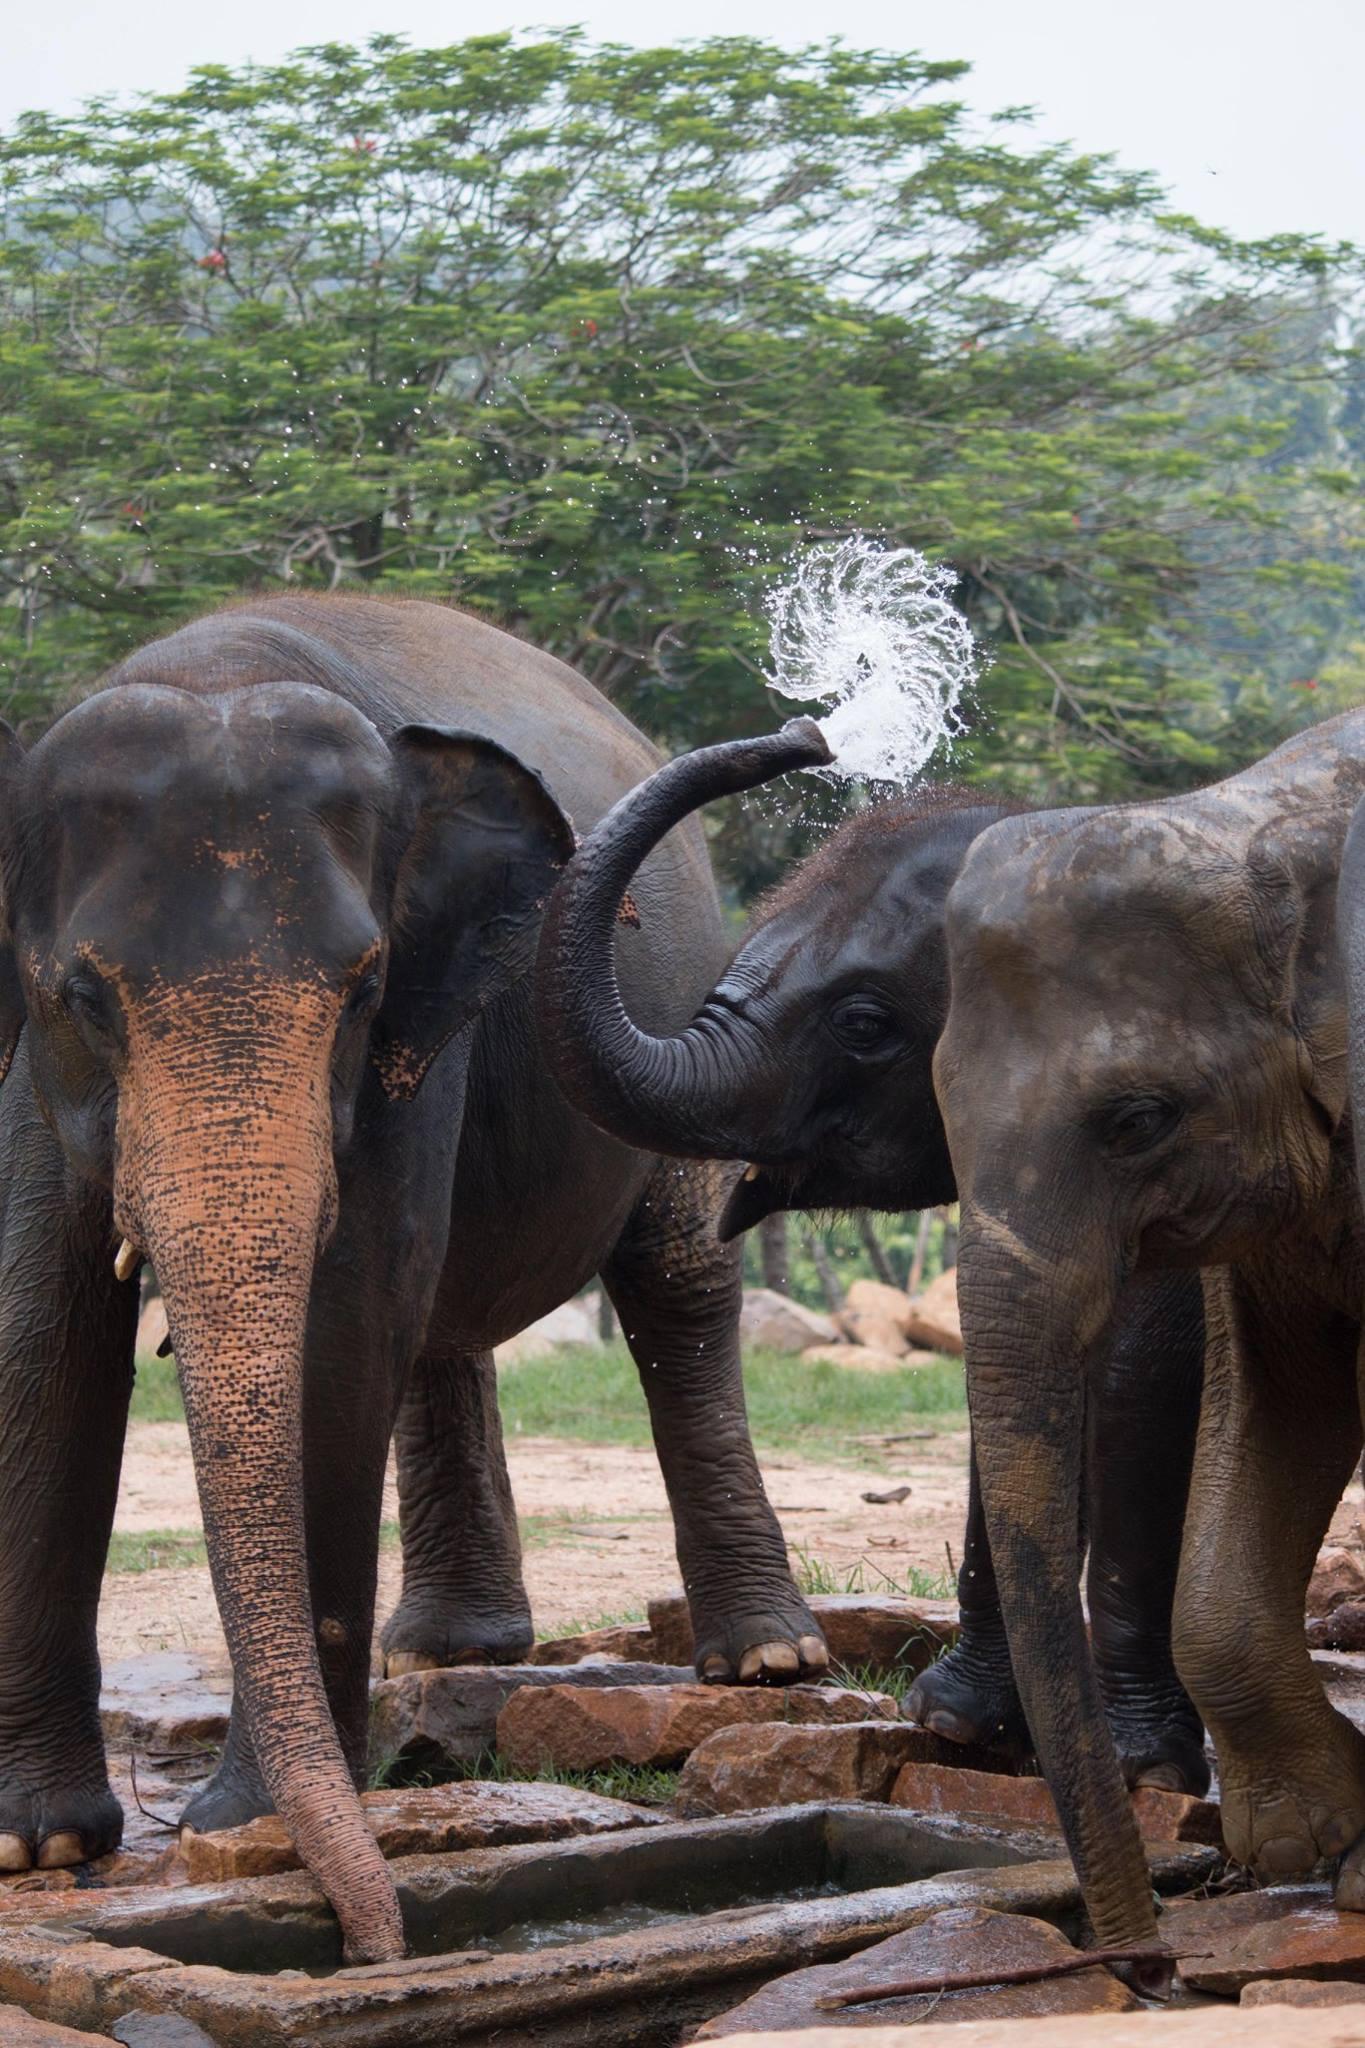 invite-to-paradise-sri-lanka-and-maldives-specialists-travel-agent-tour-operator-customer-review--feedback-joel-rhian-elephants-10.jpg